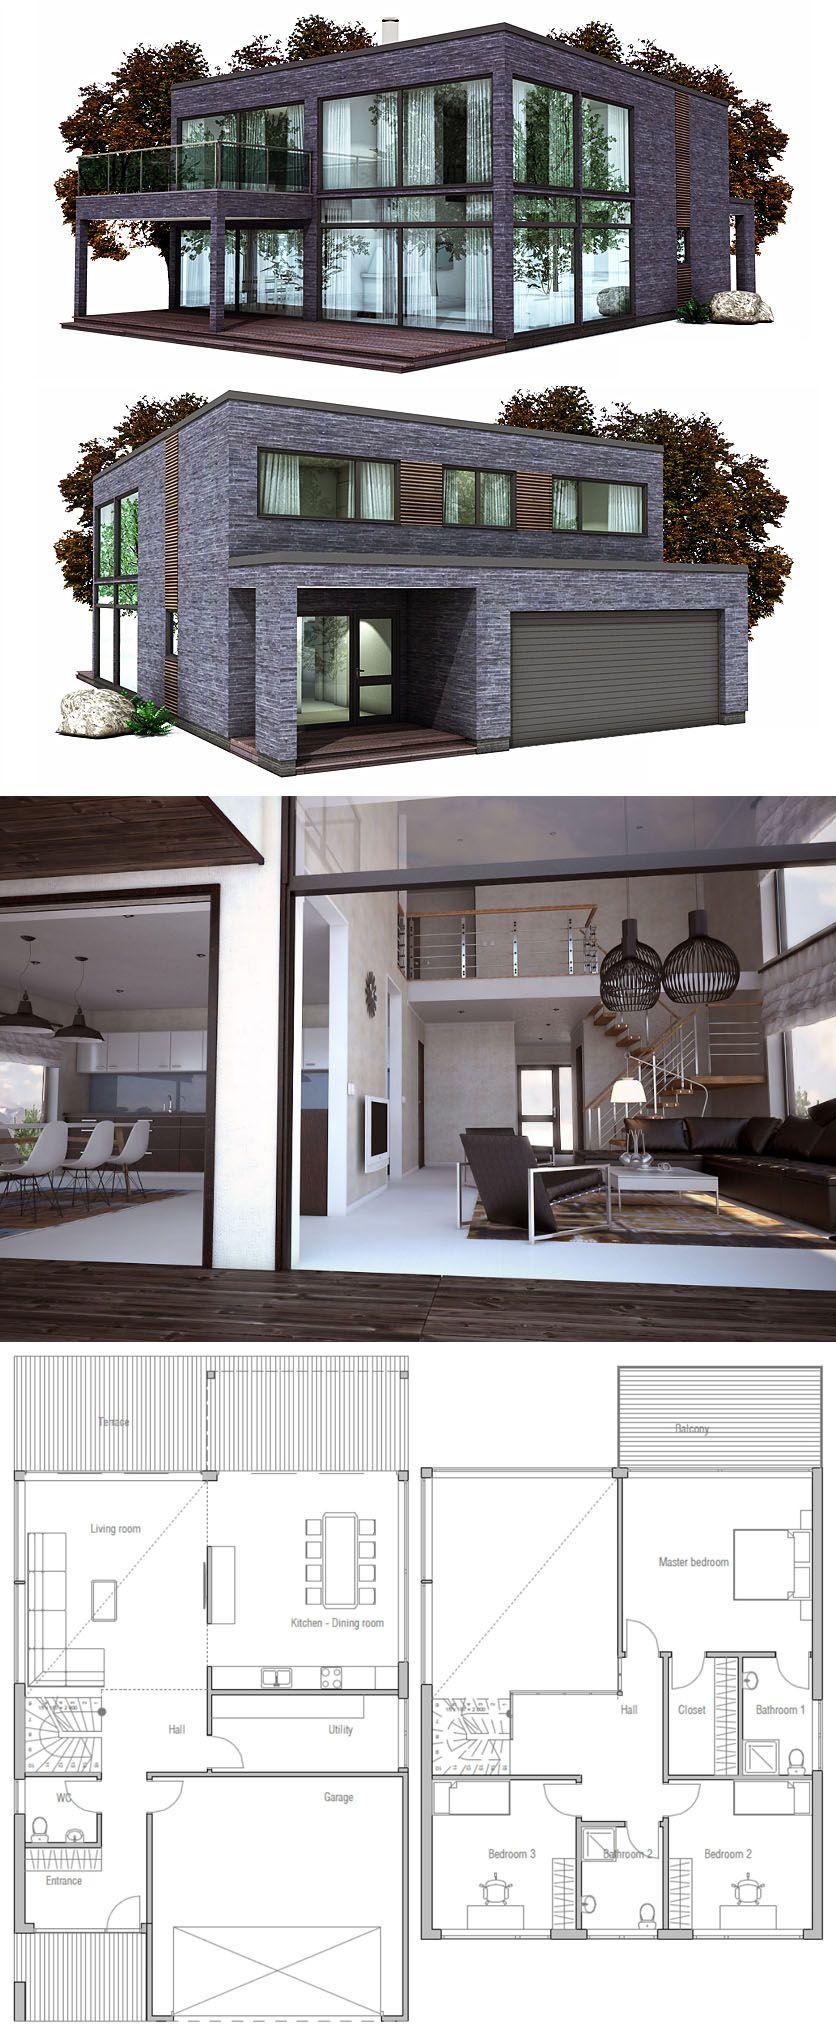 Minimalist modern house plan modular home plan prefab - Simple container house plans ...